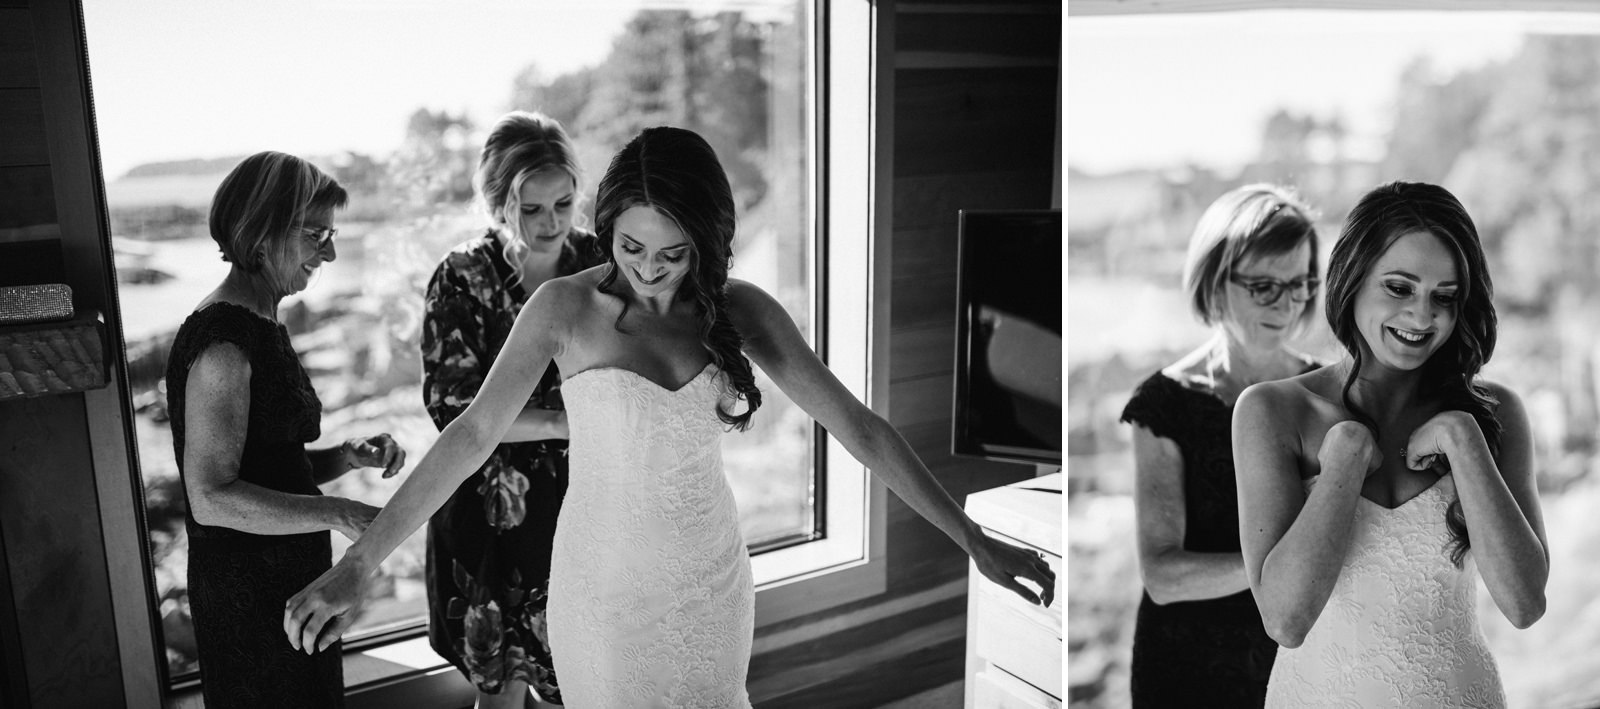 wickaninnish-inn-tofino-bc-elopement-ryan-flynn-photography-00006.JPG